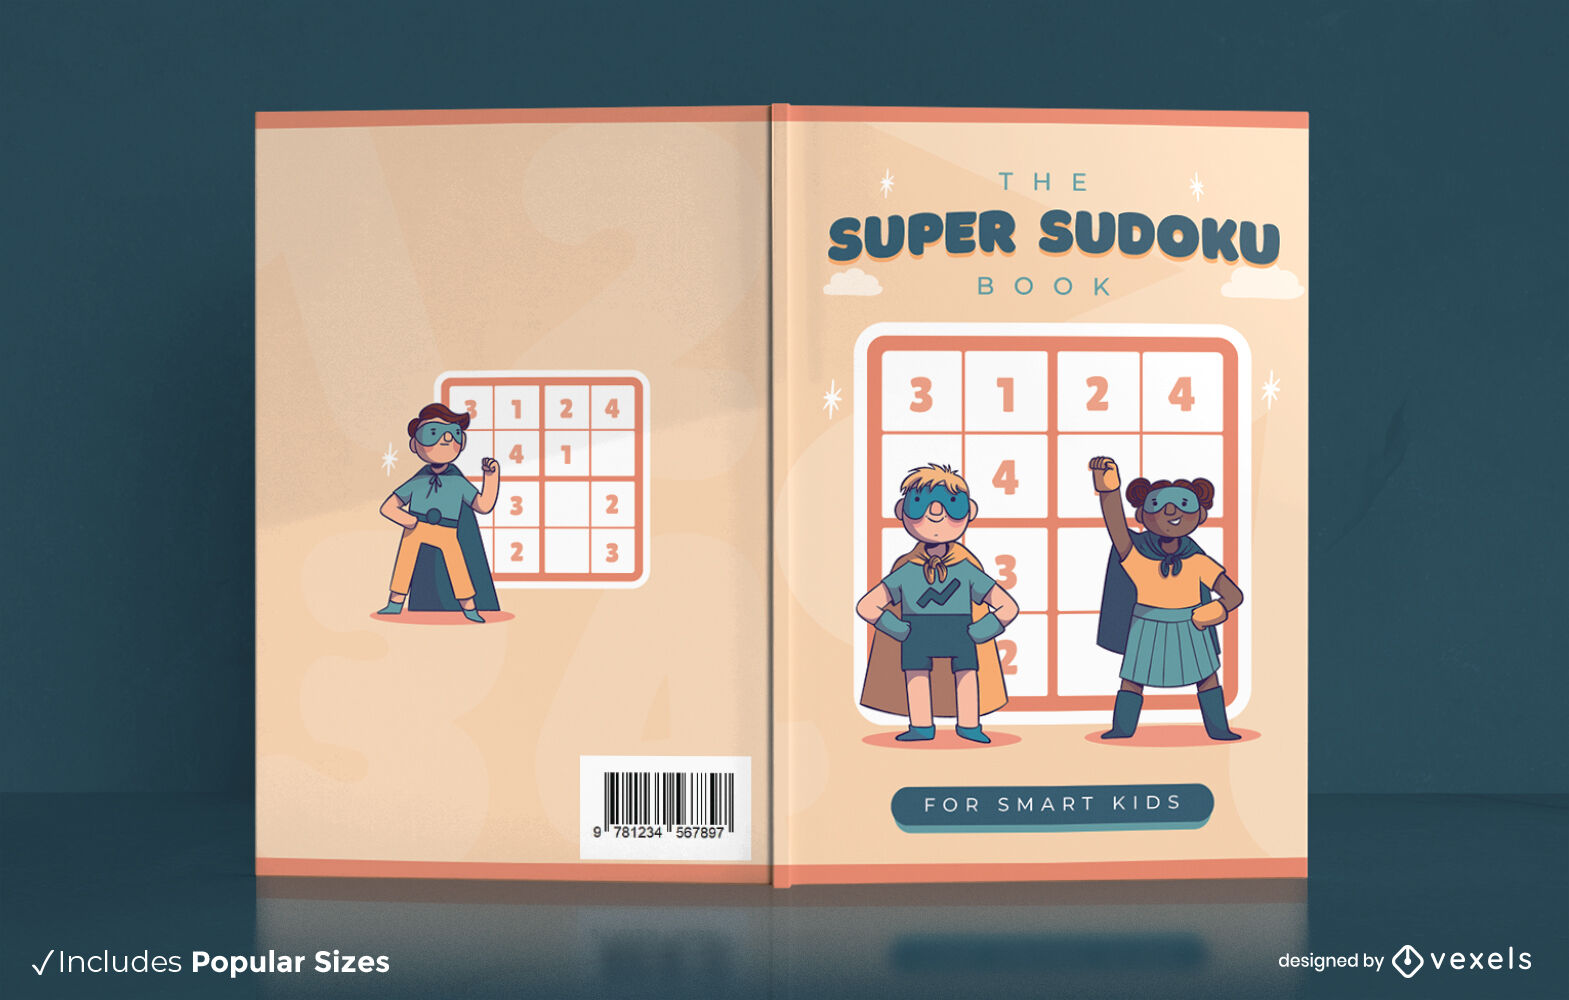 Super sudoku book cover design